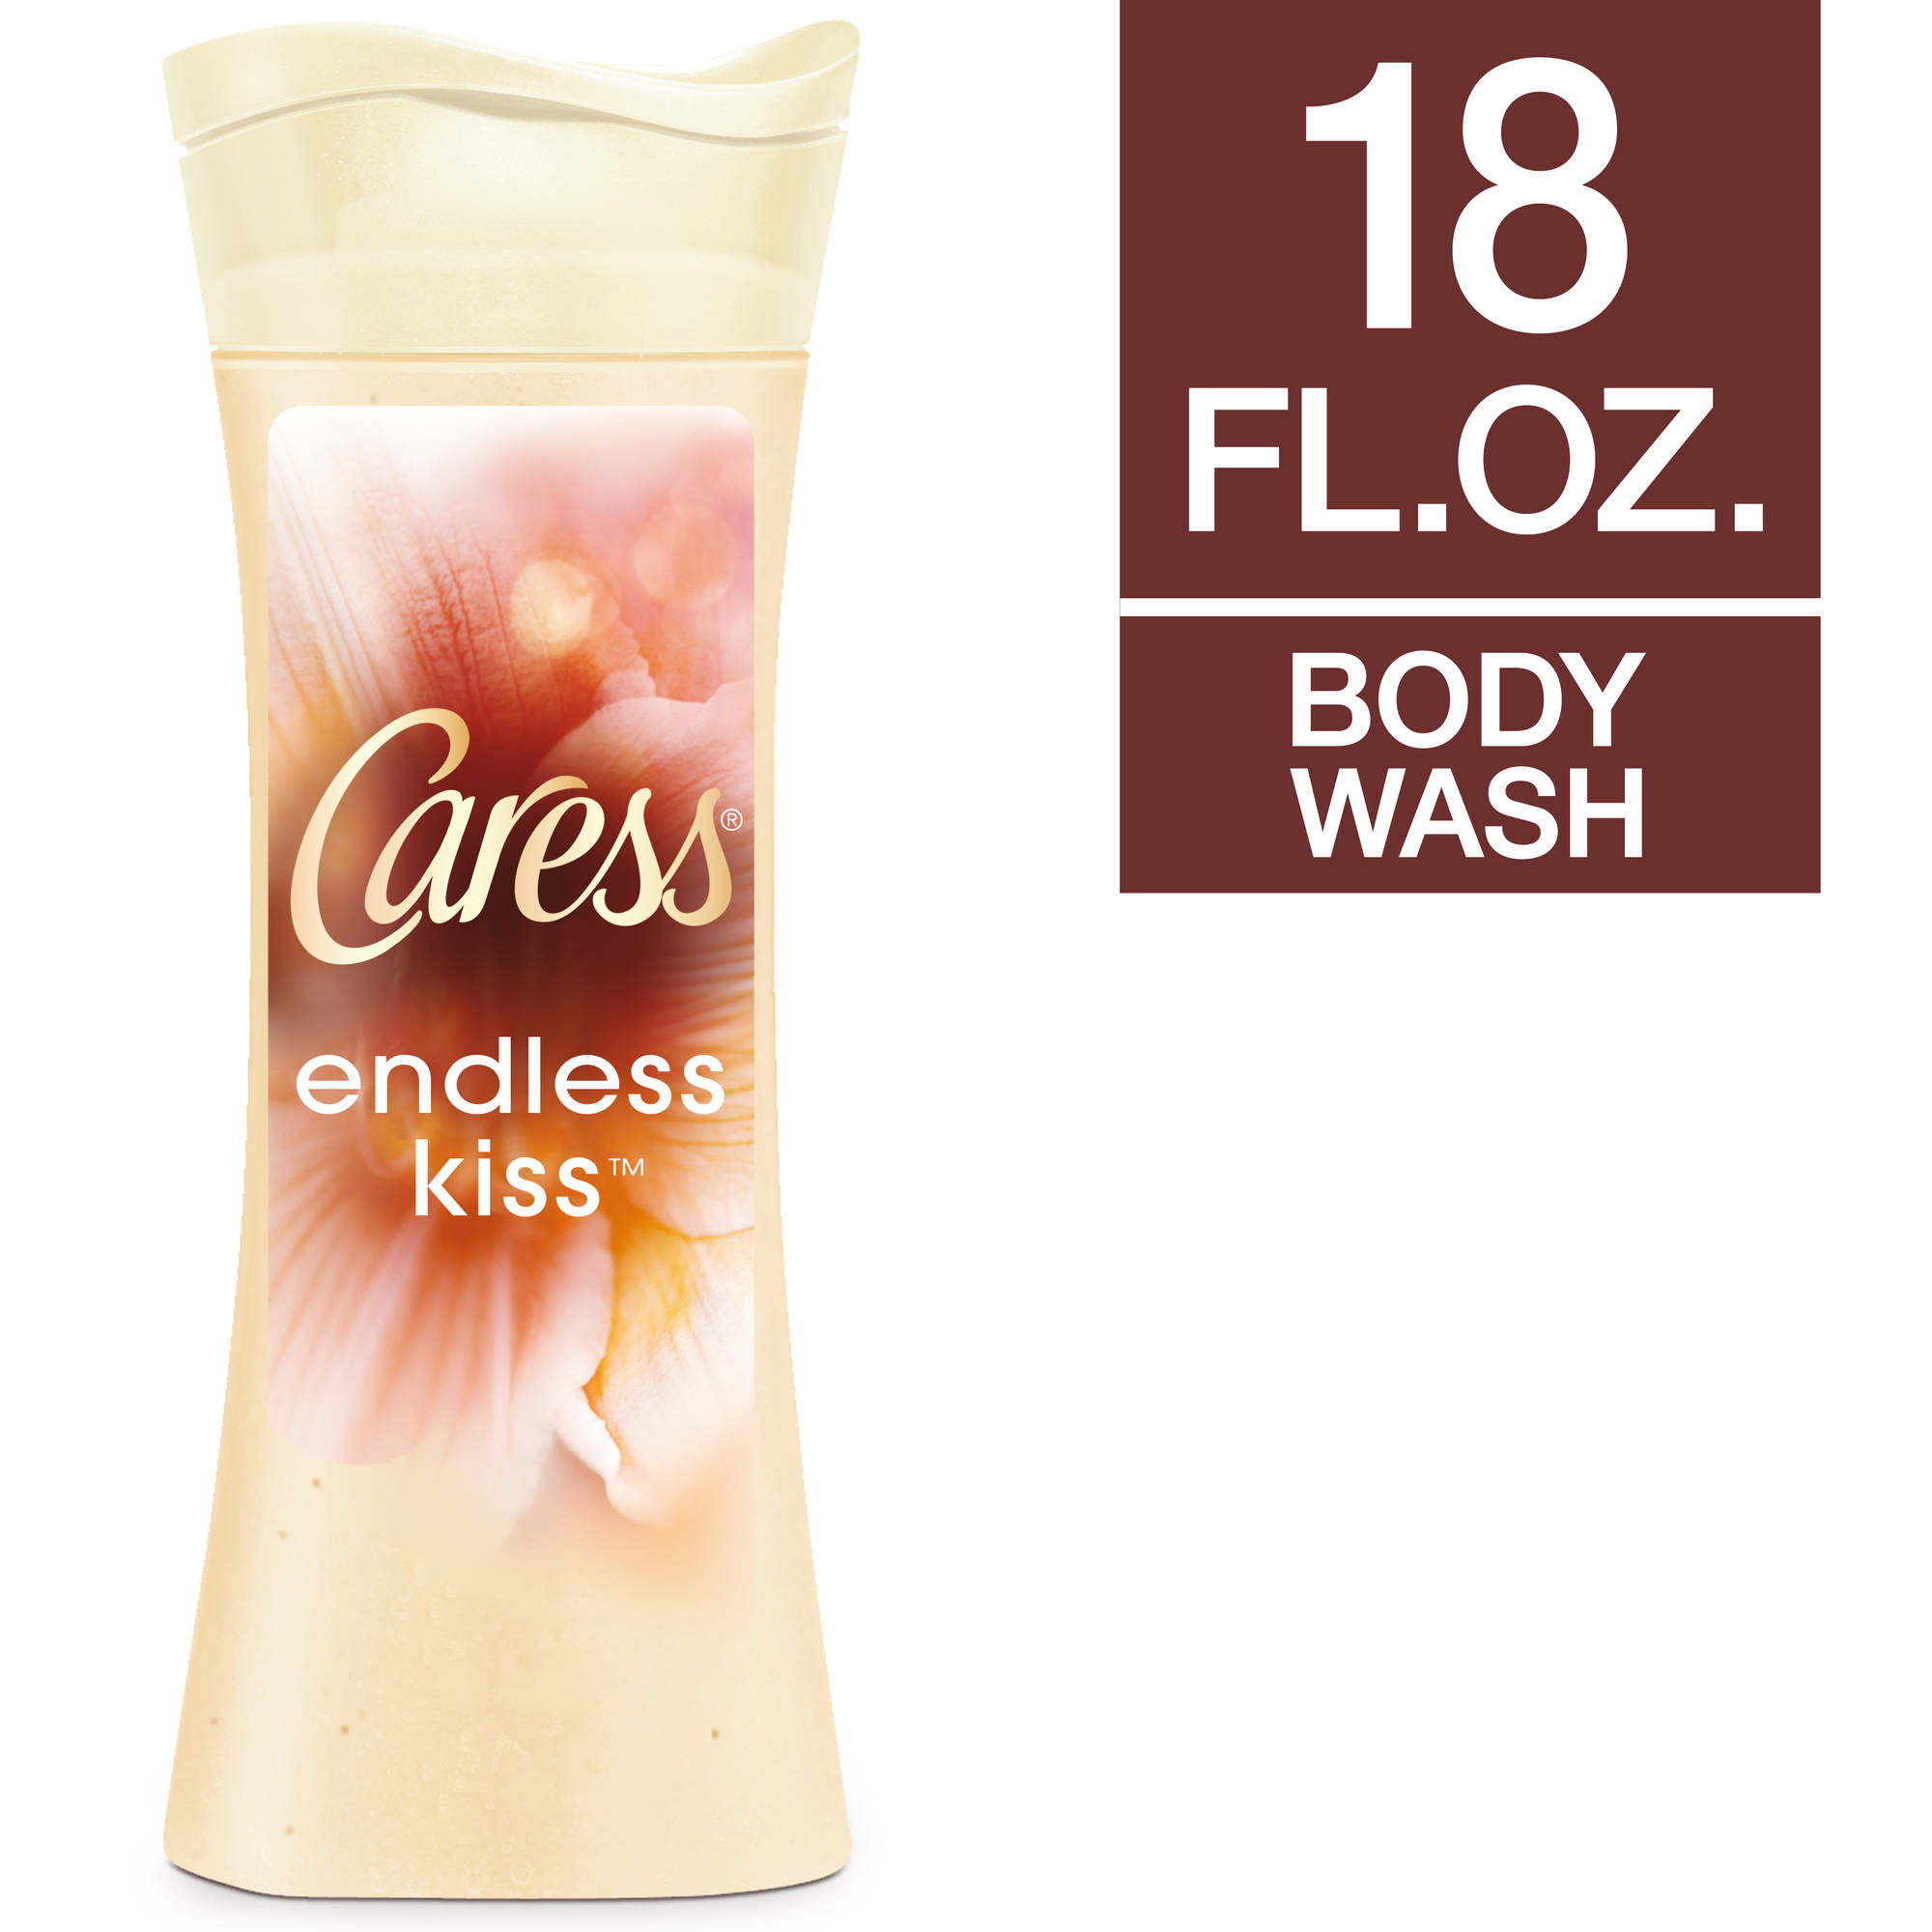 Caress Endless Kiss Creamy Vanilla & Sandalwood Body Wash, 18 oz